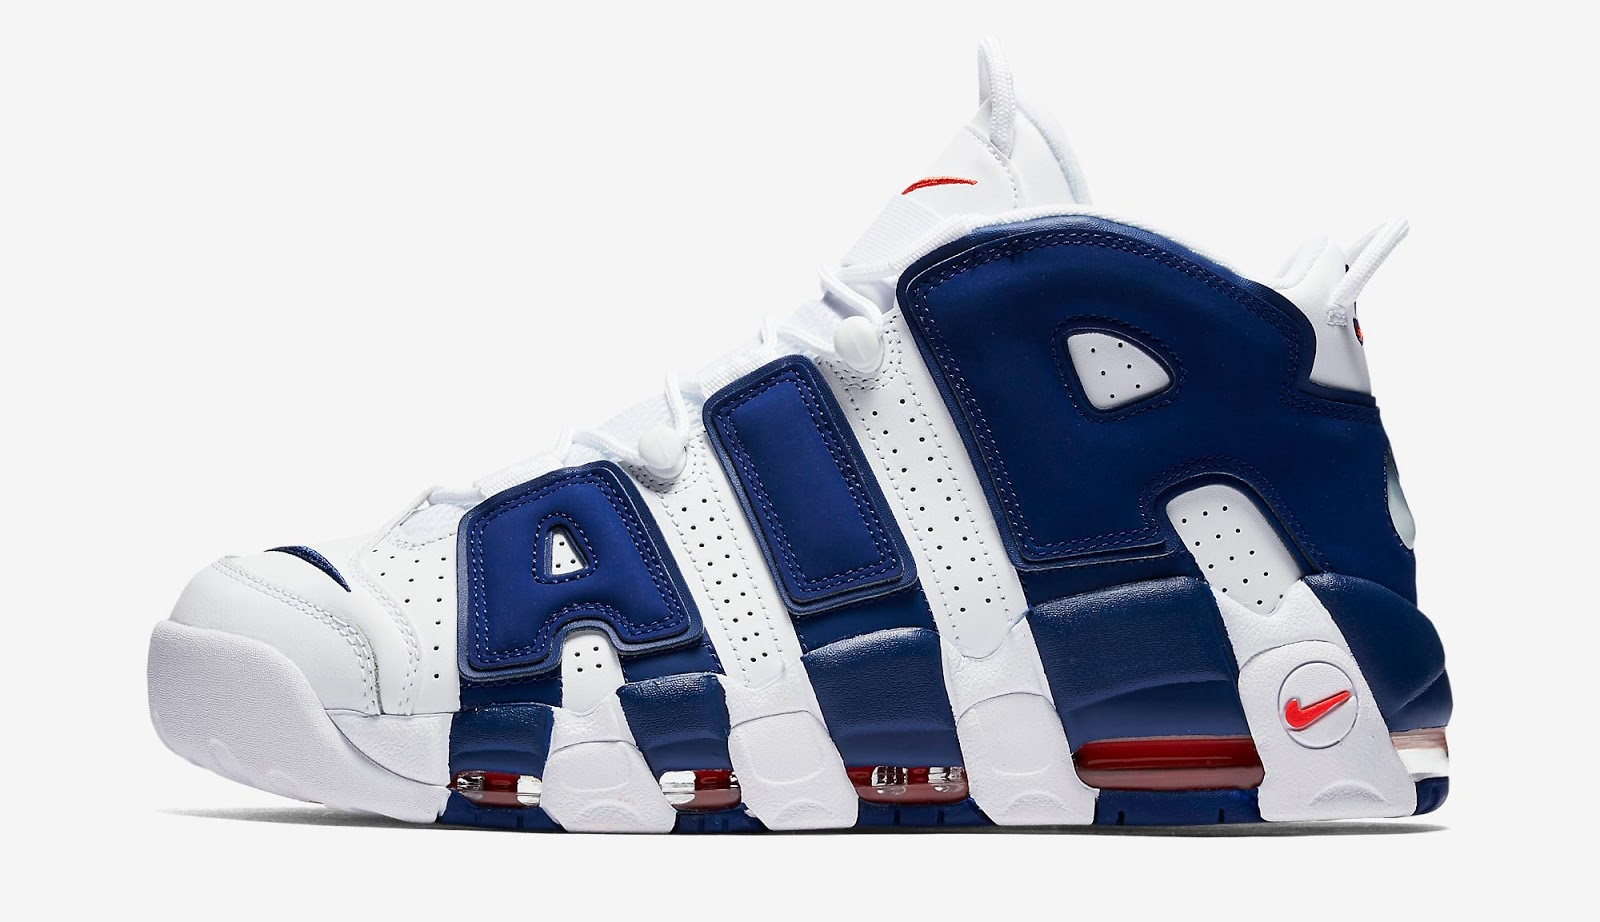 Nike Air More Uptempo 'Knicks' Analykix Analykix 'Knicks' d8d2a1